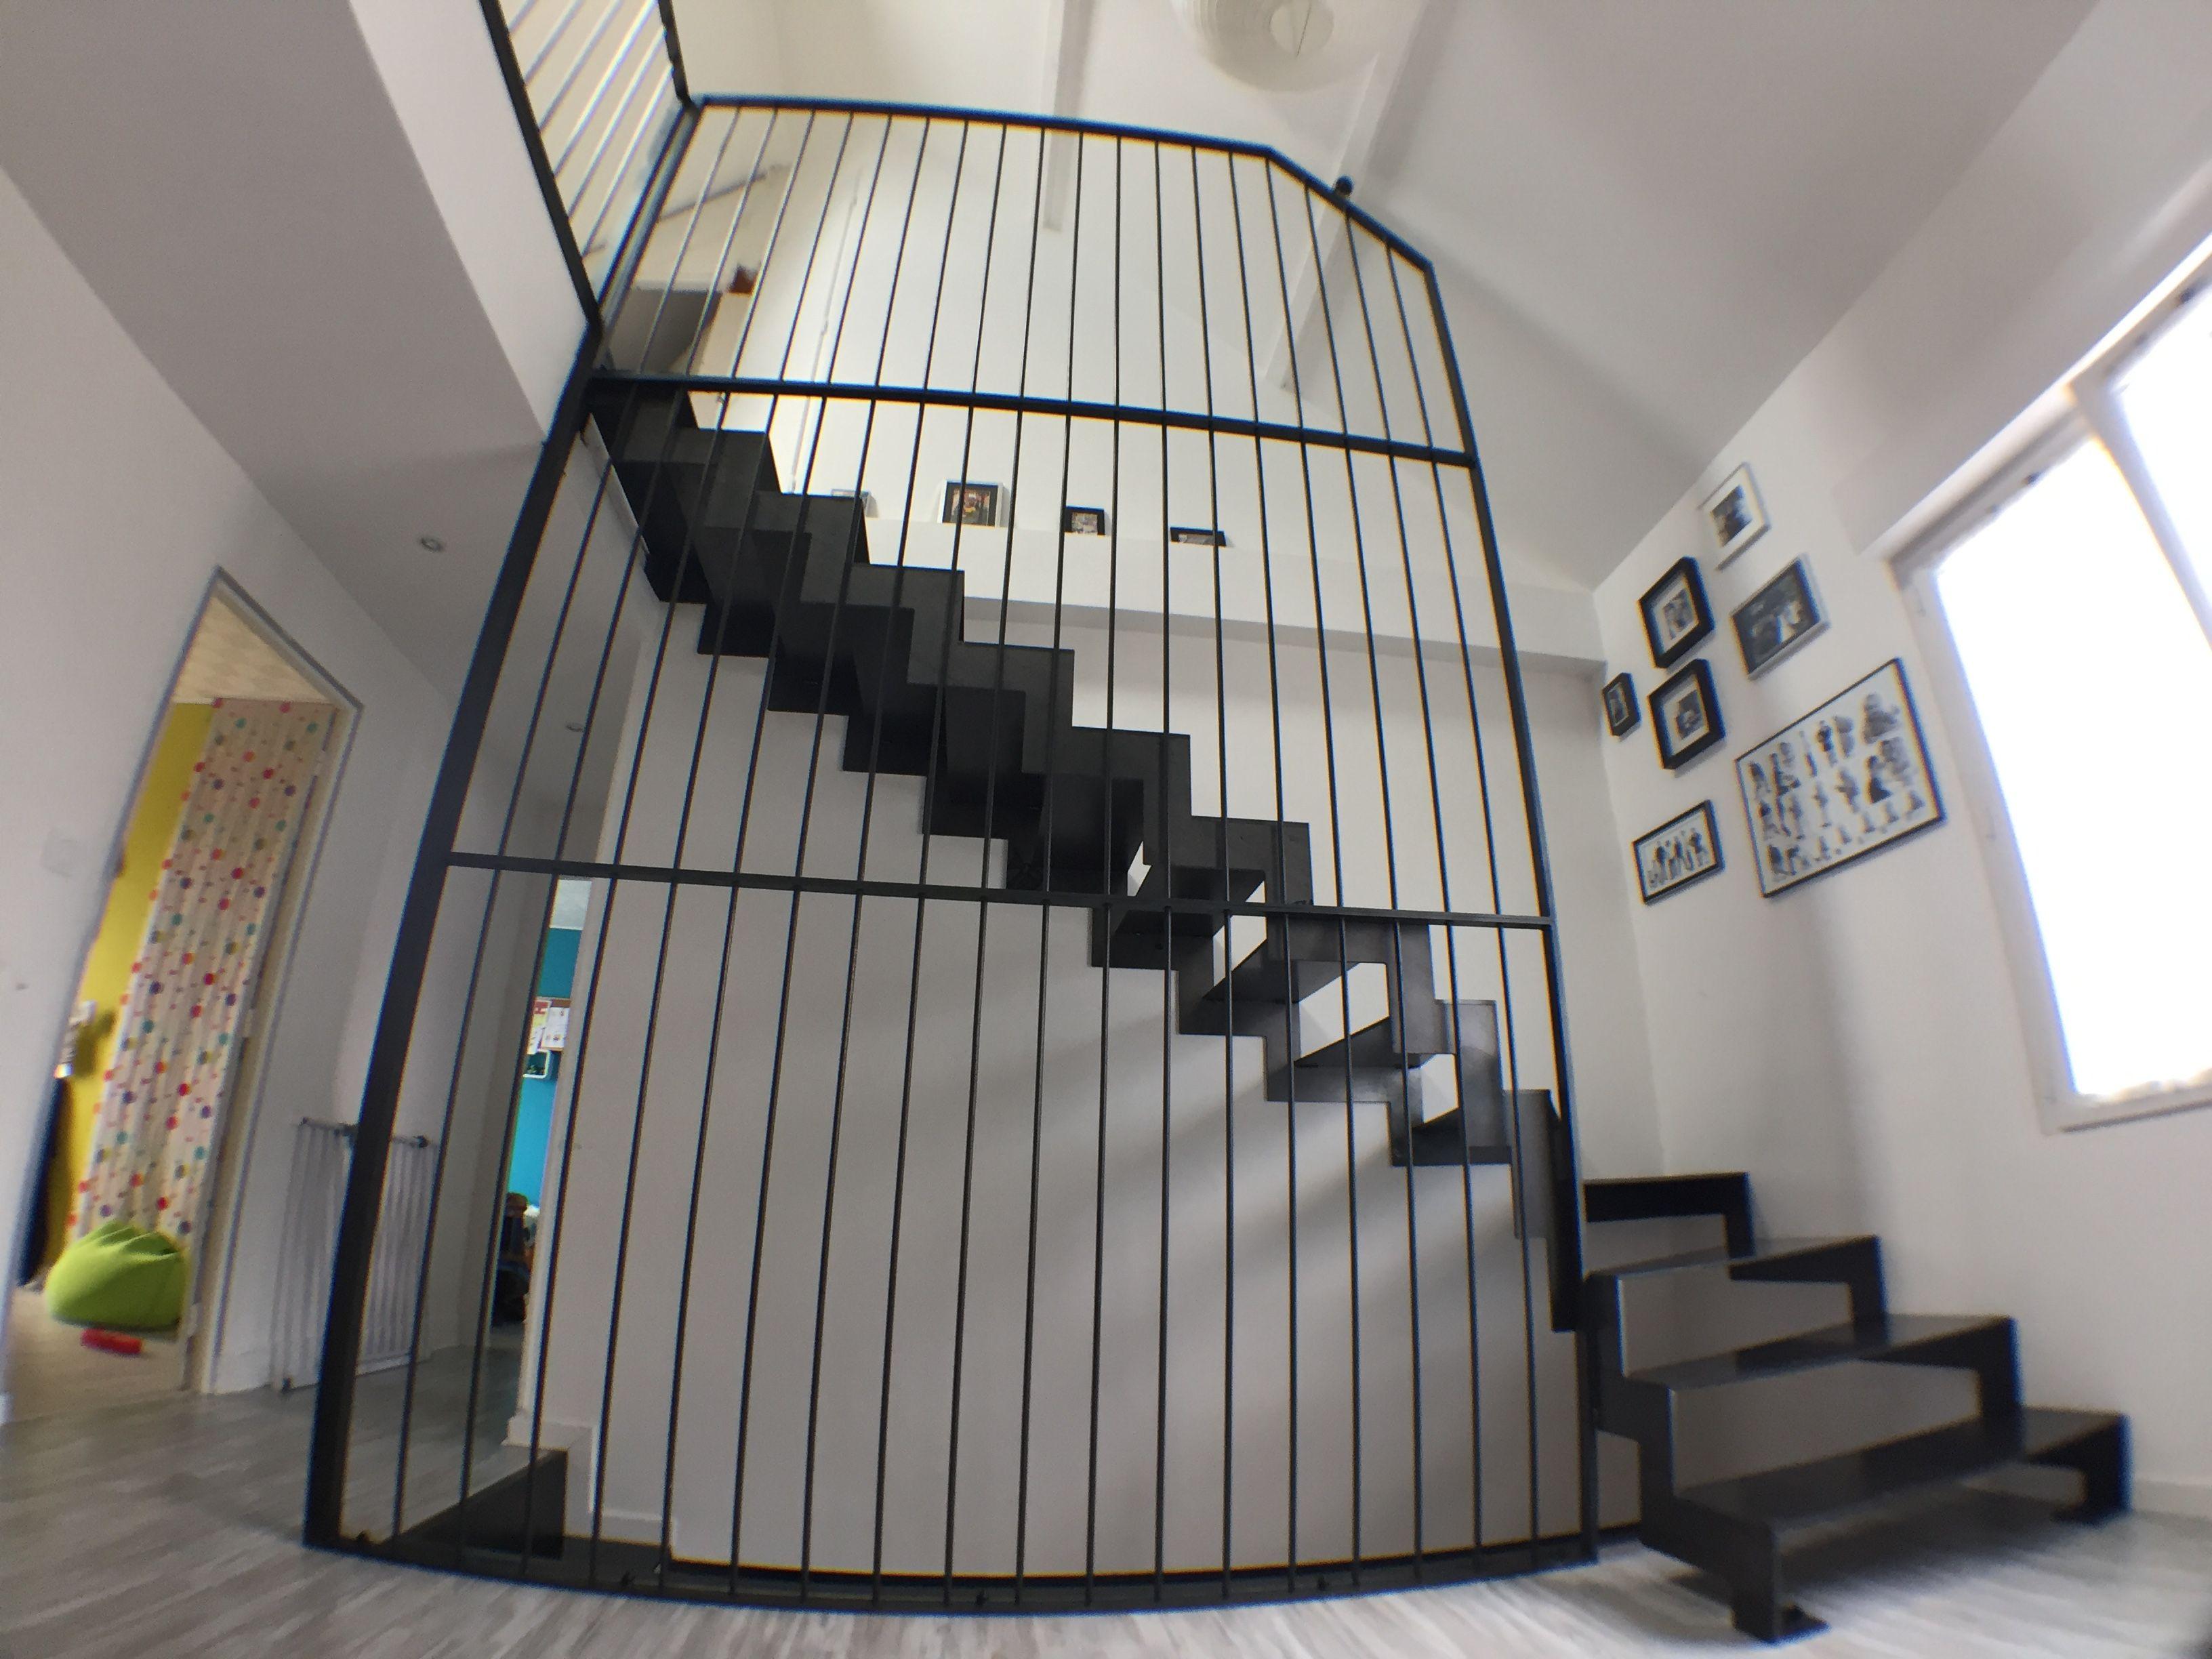 escalier metal brut cir garde corps barraudage vertical escalier tout metal bois en acier. Black Bedroom Furniture Sets. Home Design Ideas